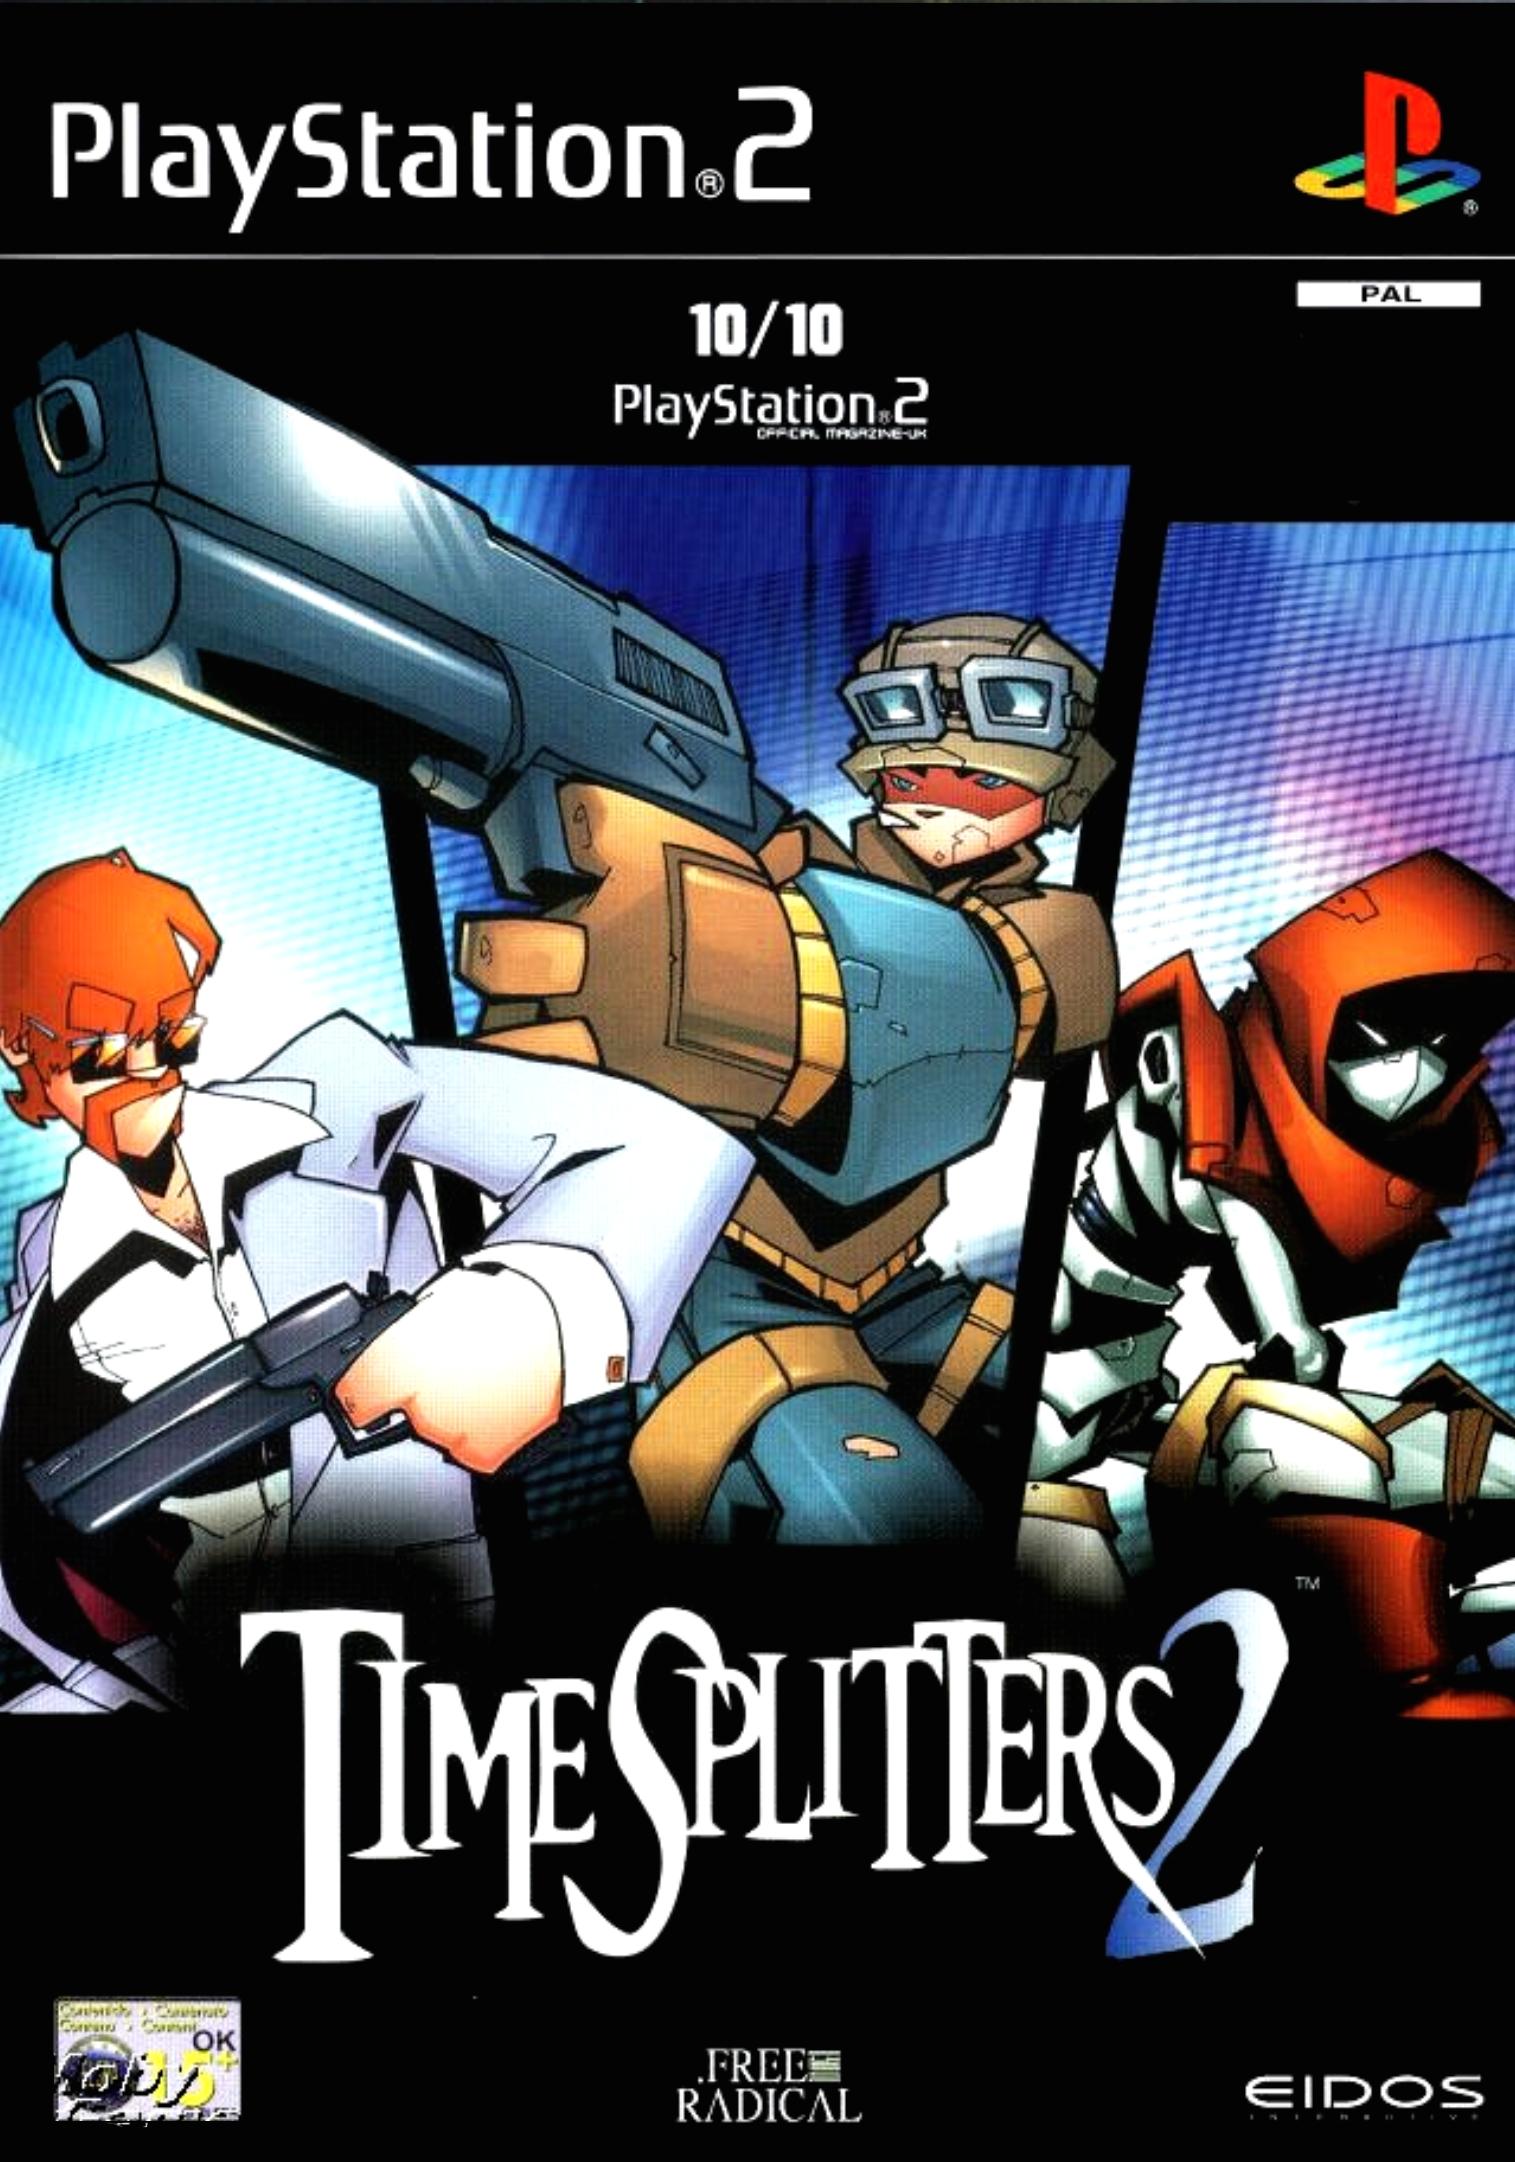 Timesplitters/PS2